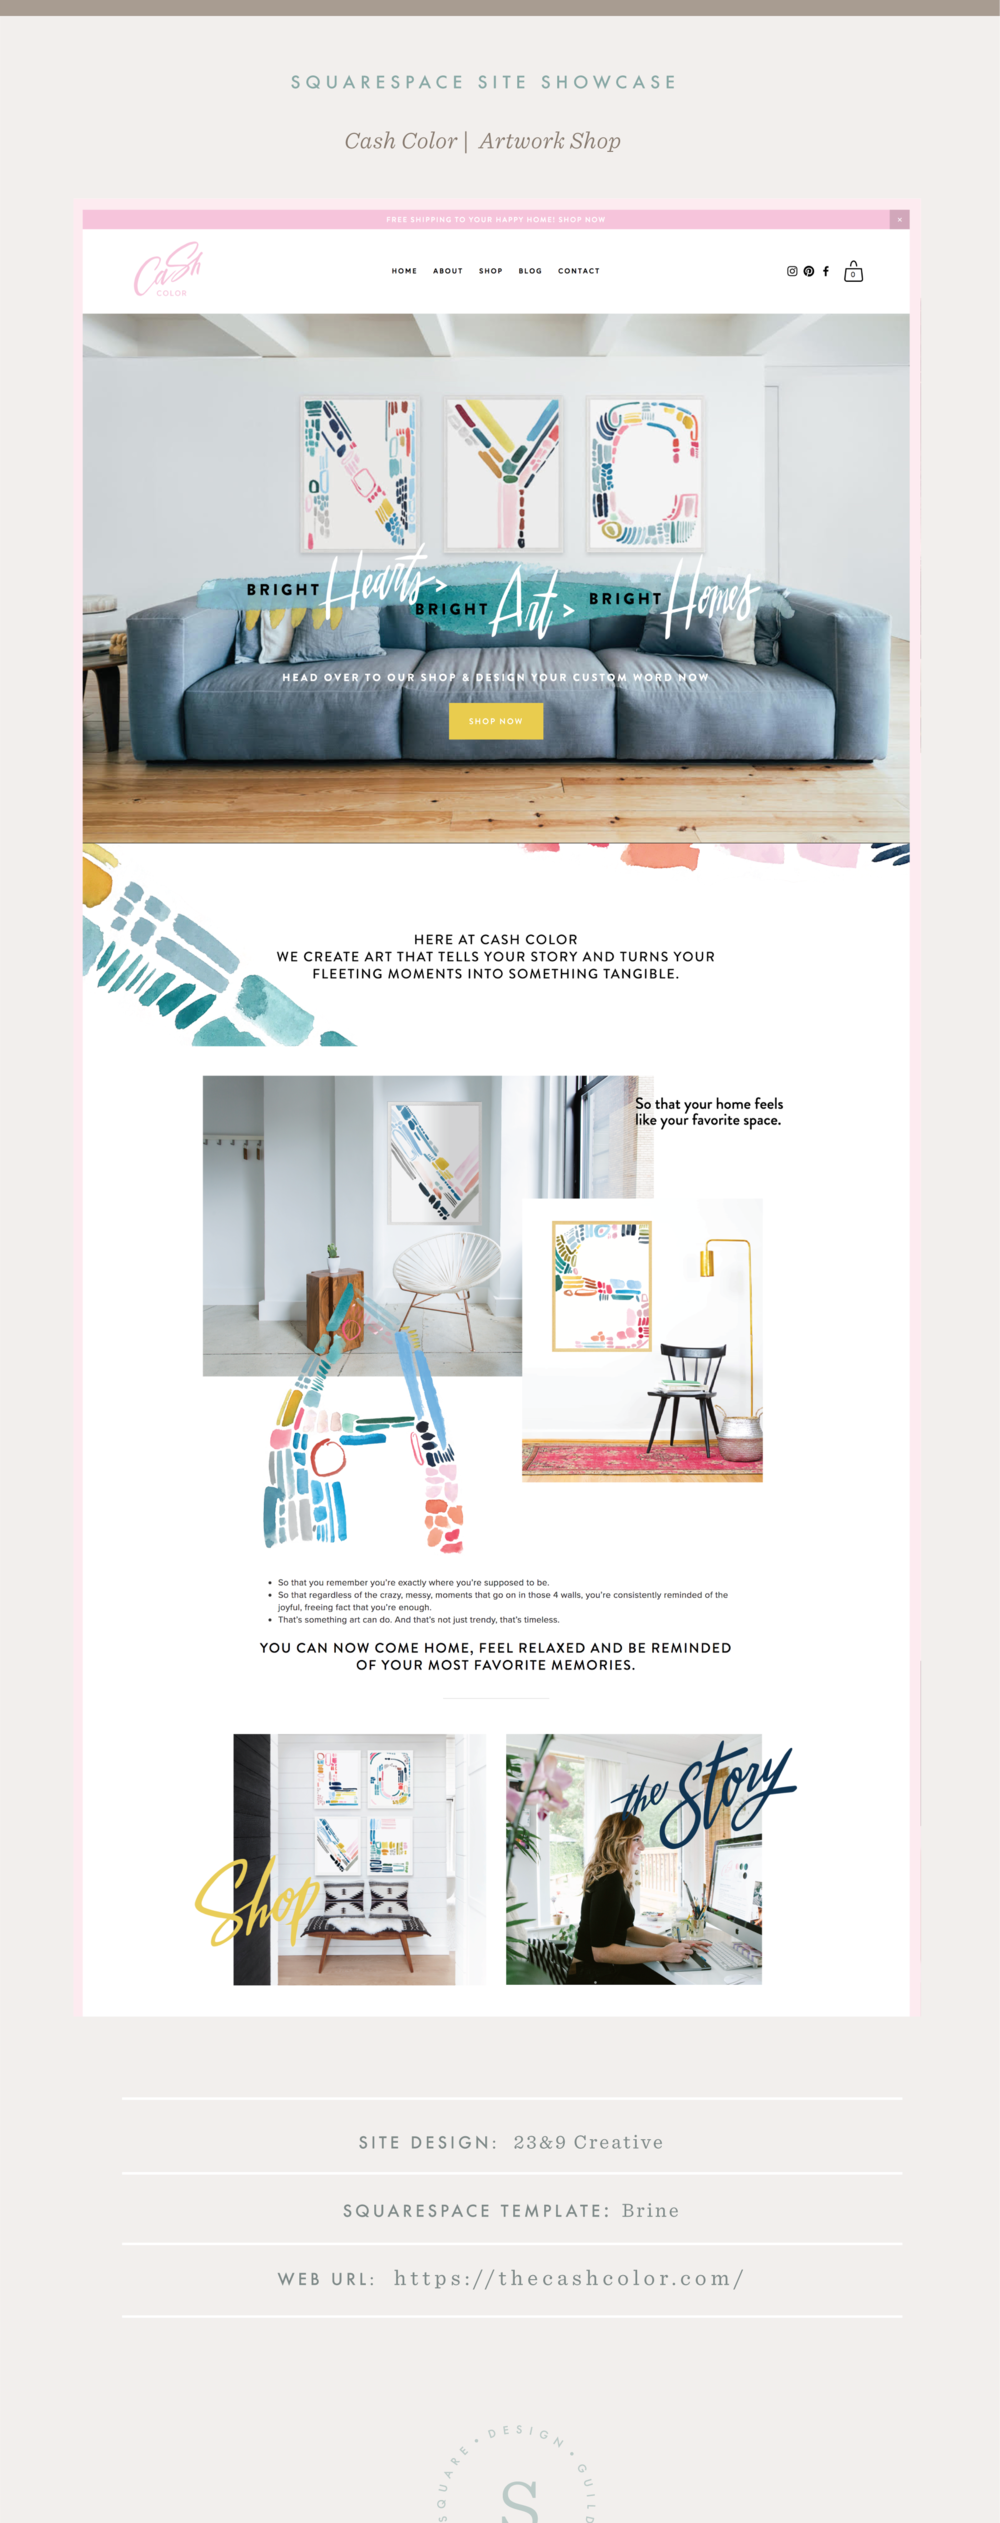 Squarespace Site Showcase | Cash Color | Brine Template